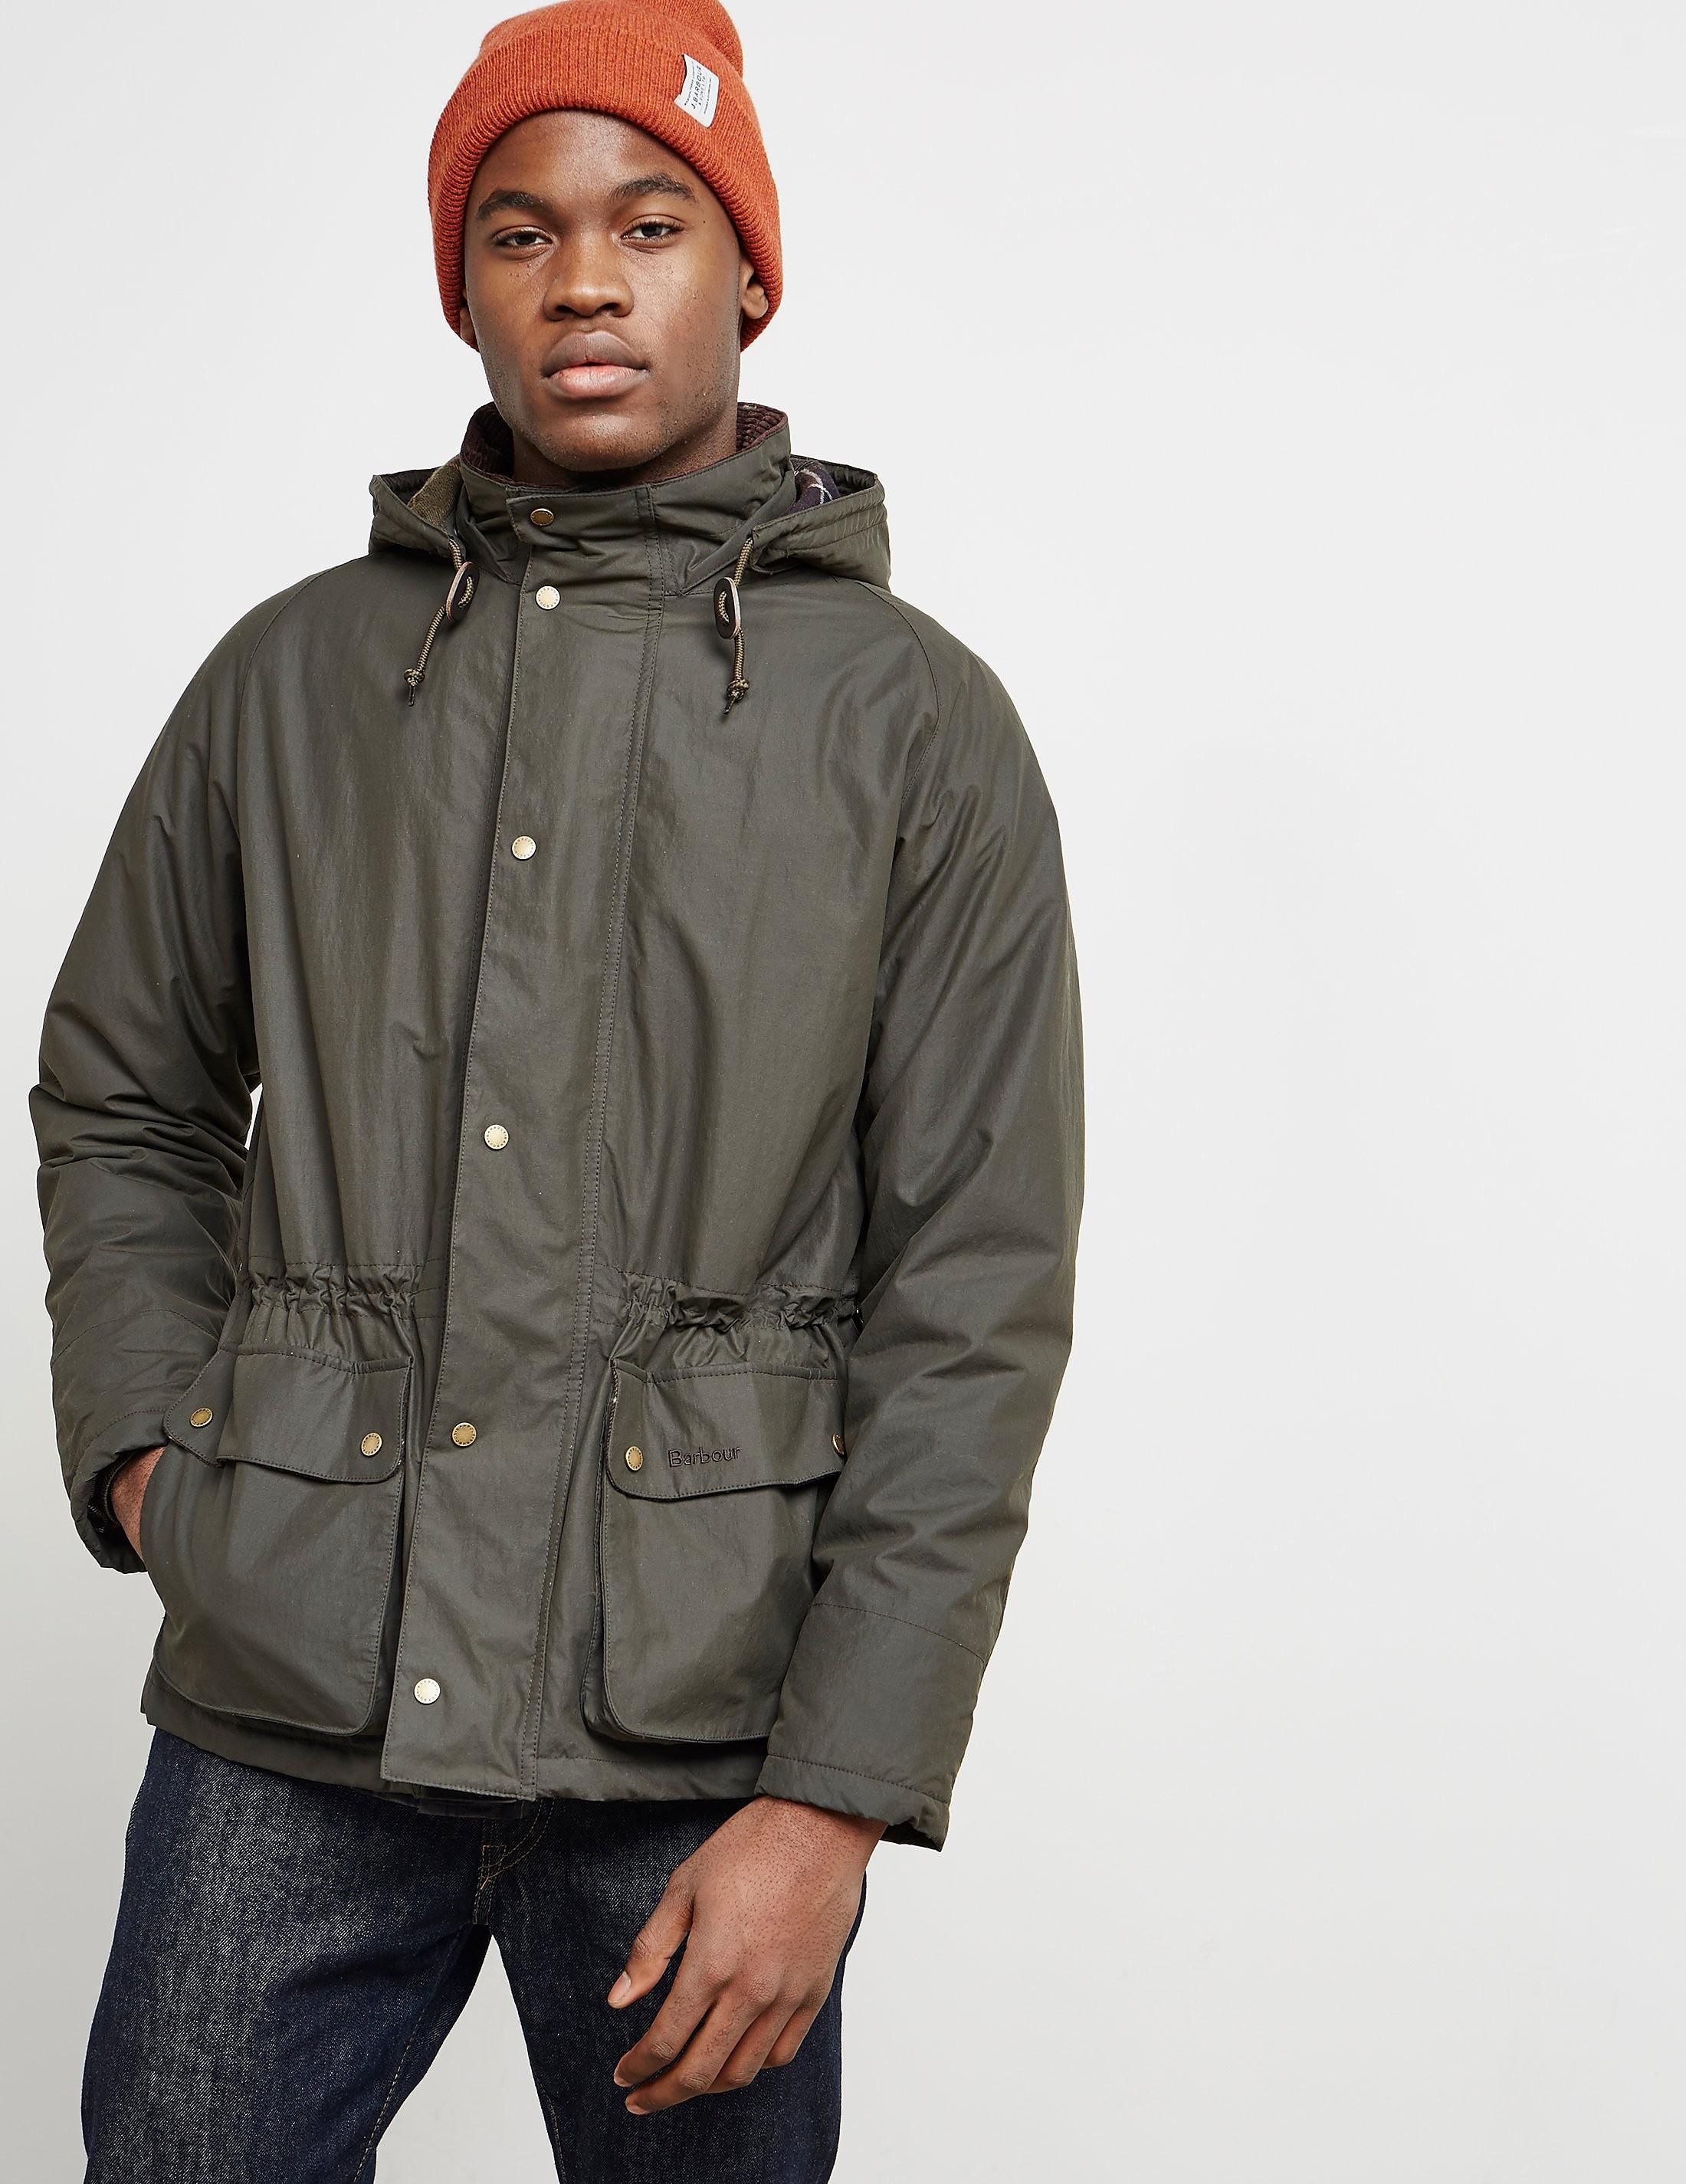 Barbour Lifestyle Woodfold Jacket